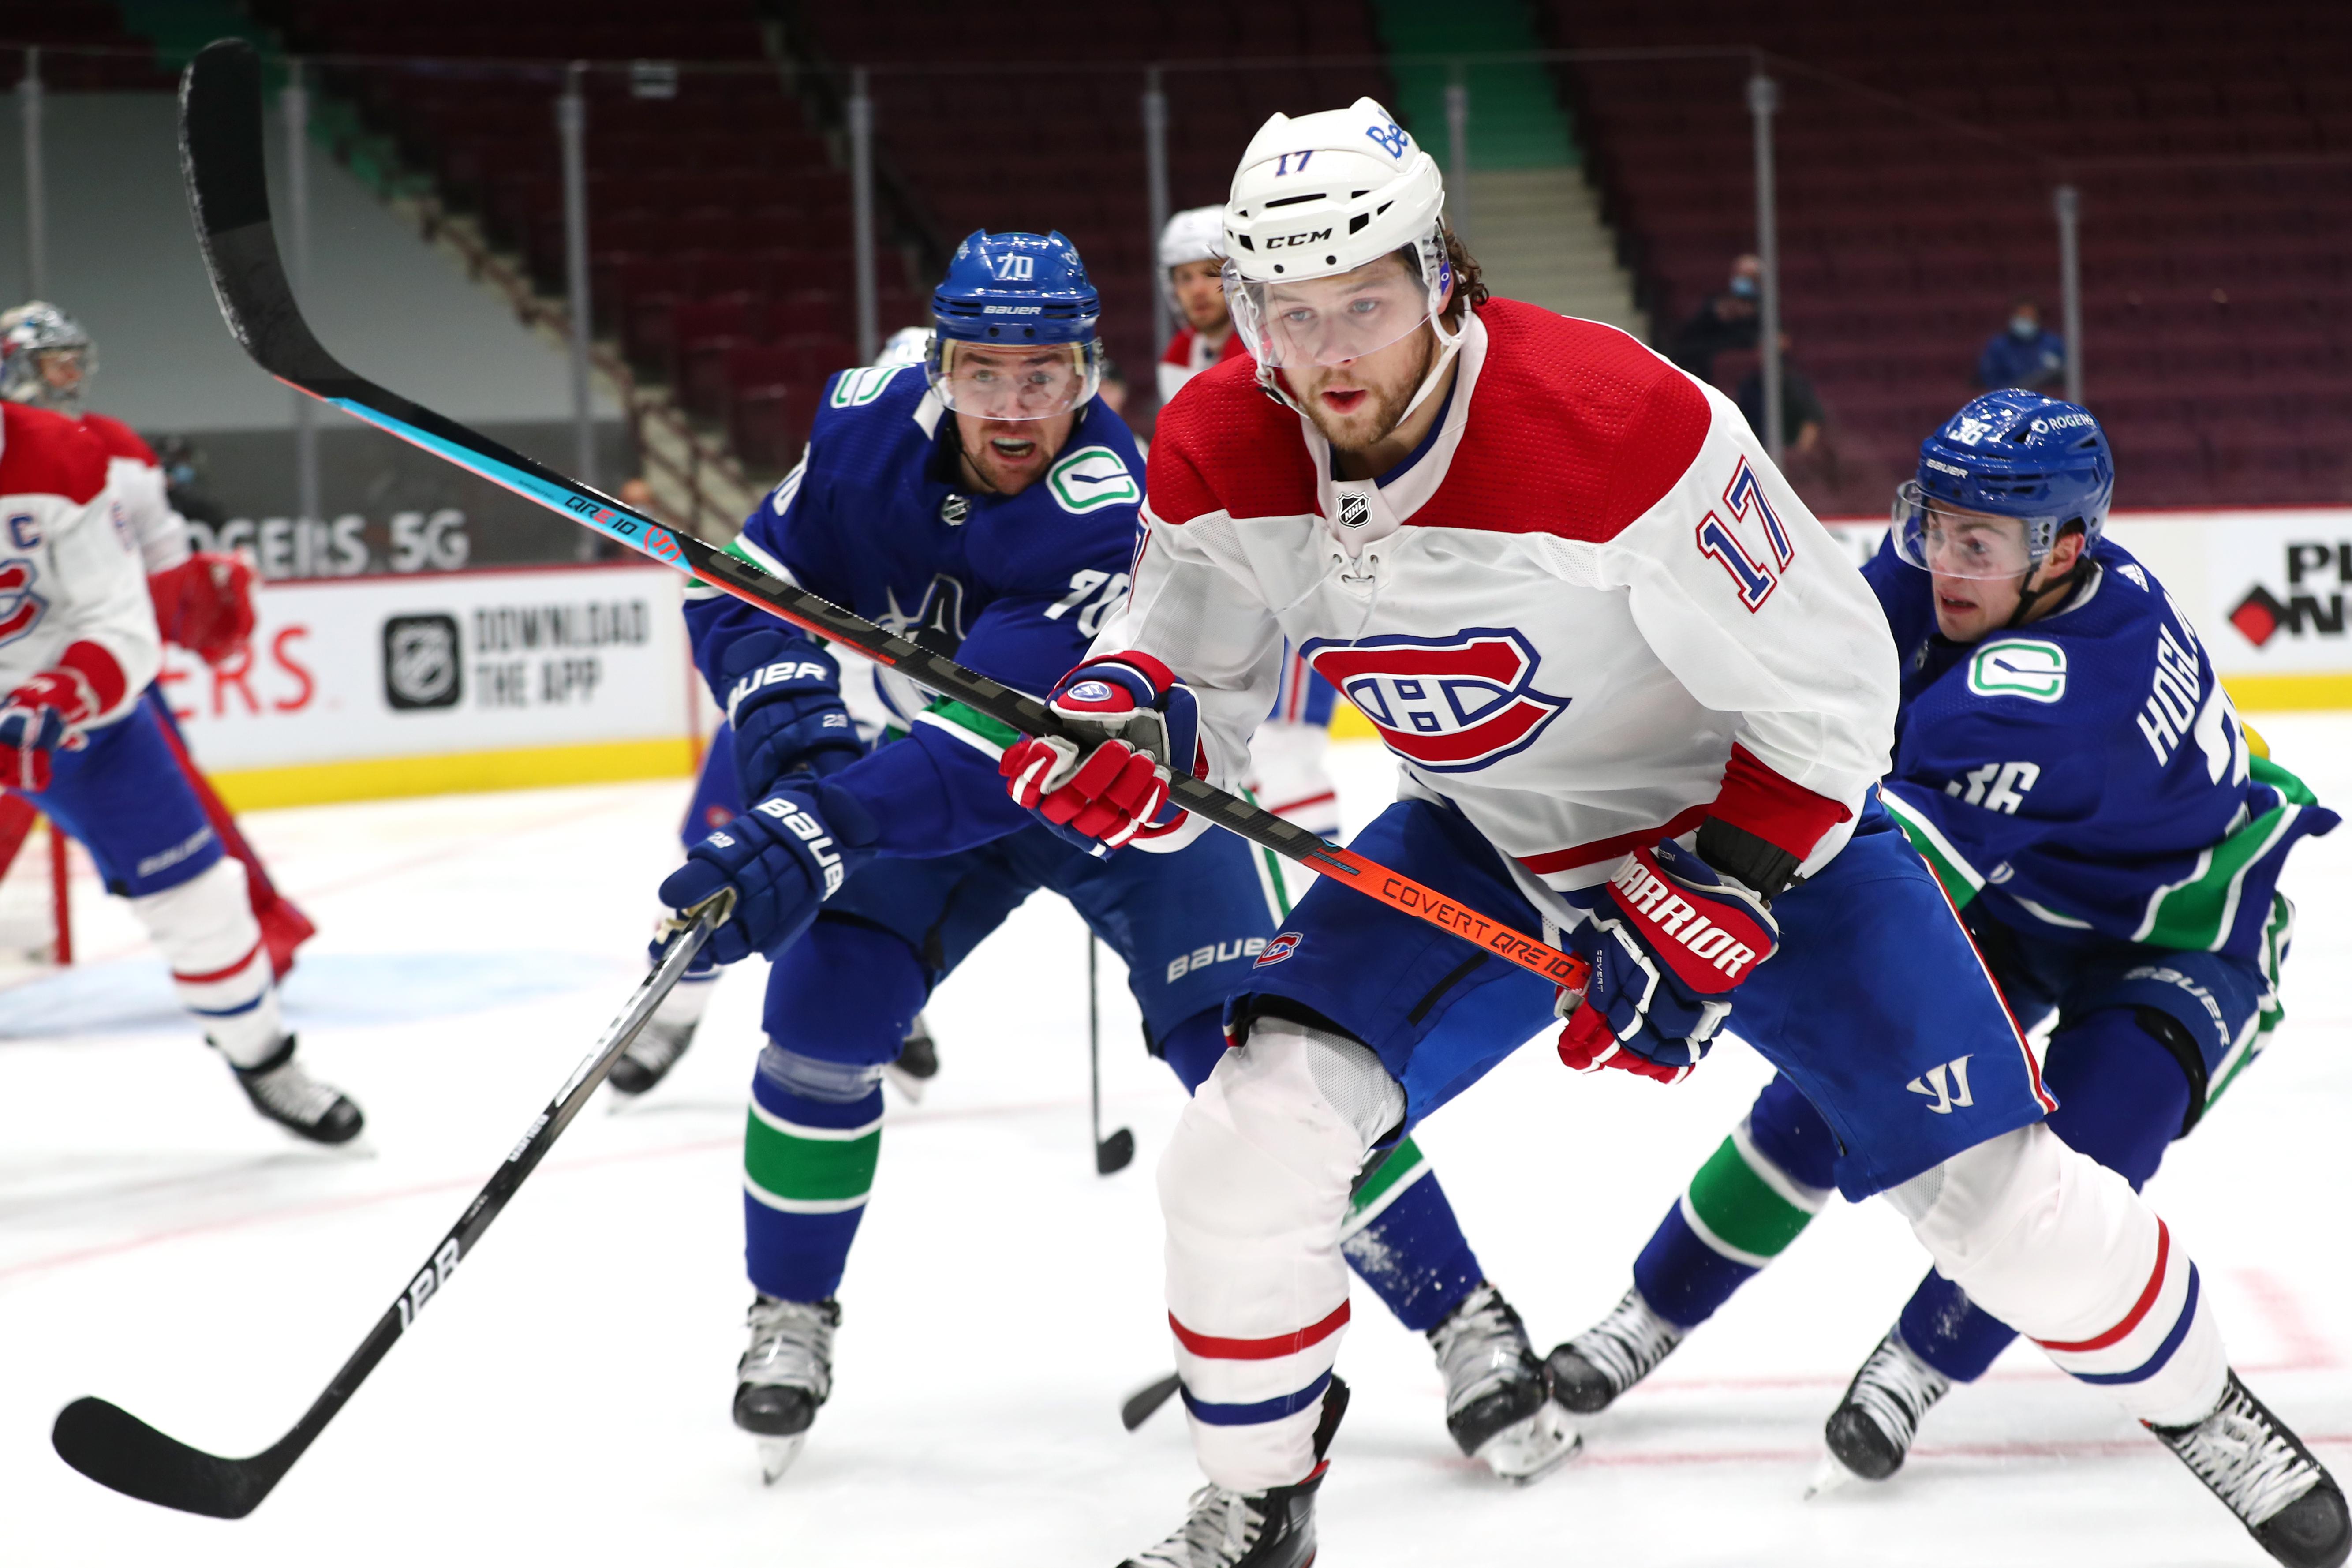 NHL: JAN 20 Canadiens at Canucks